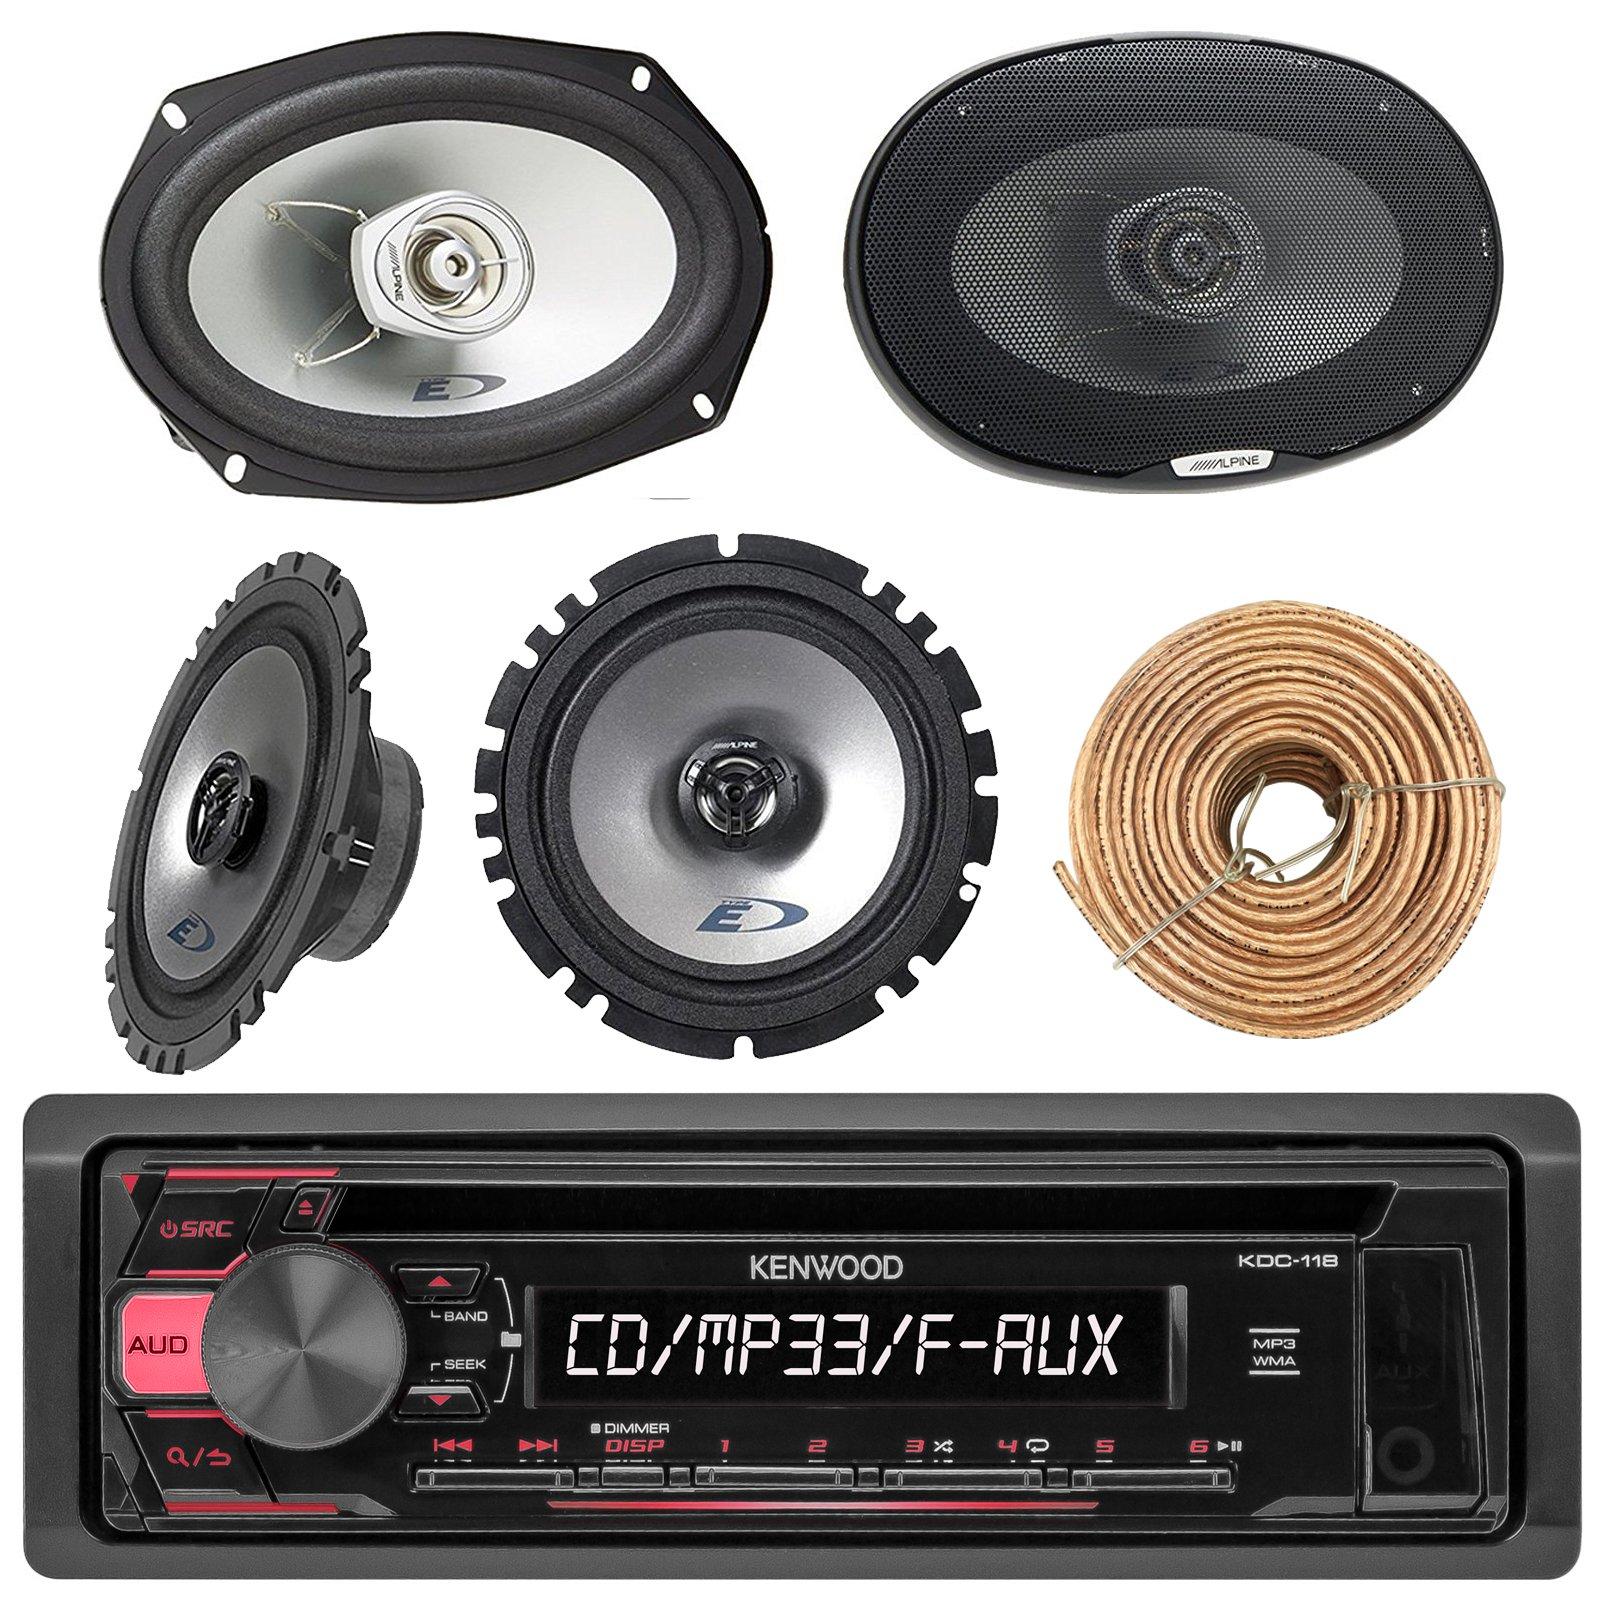 Kenwood KDC118 Car Radio AUX CD Player Receiver - Bundle Combo With 2x Alpine 6.5'' 80W 2-Way Coaxial Car Speakers + 2x 6x9 Inch 280W Black Speaker + Enrock 50 Ft 18G Speaker Wire